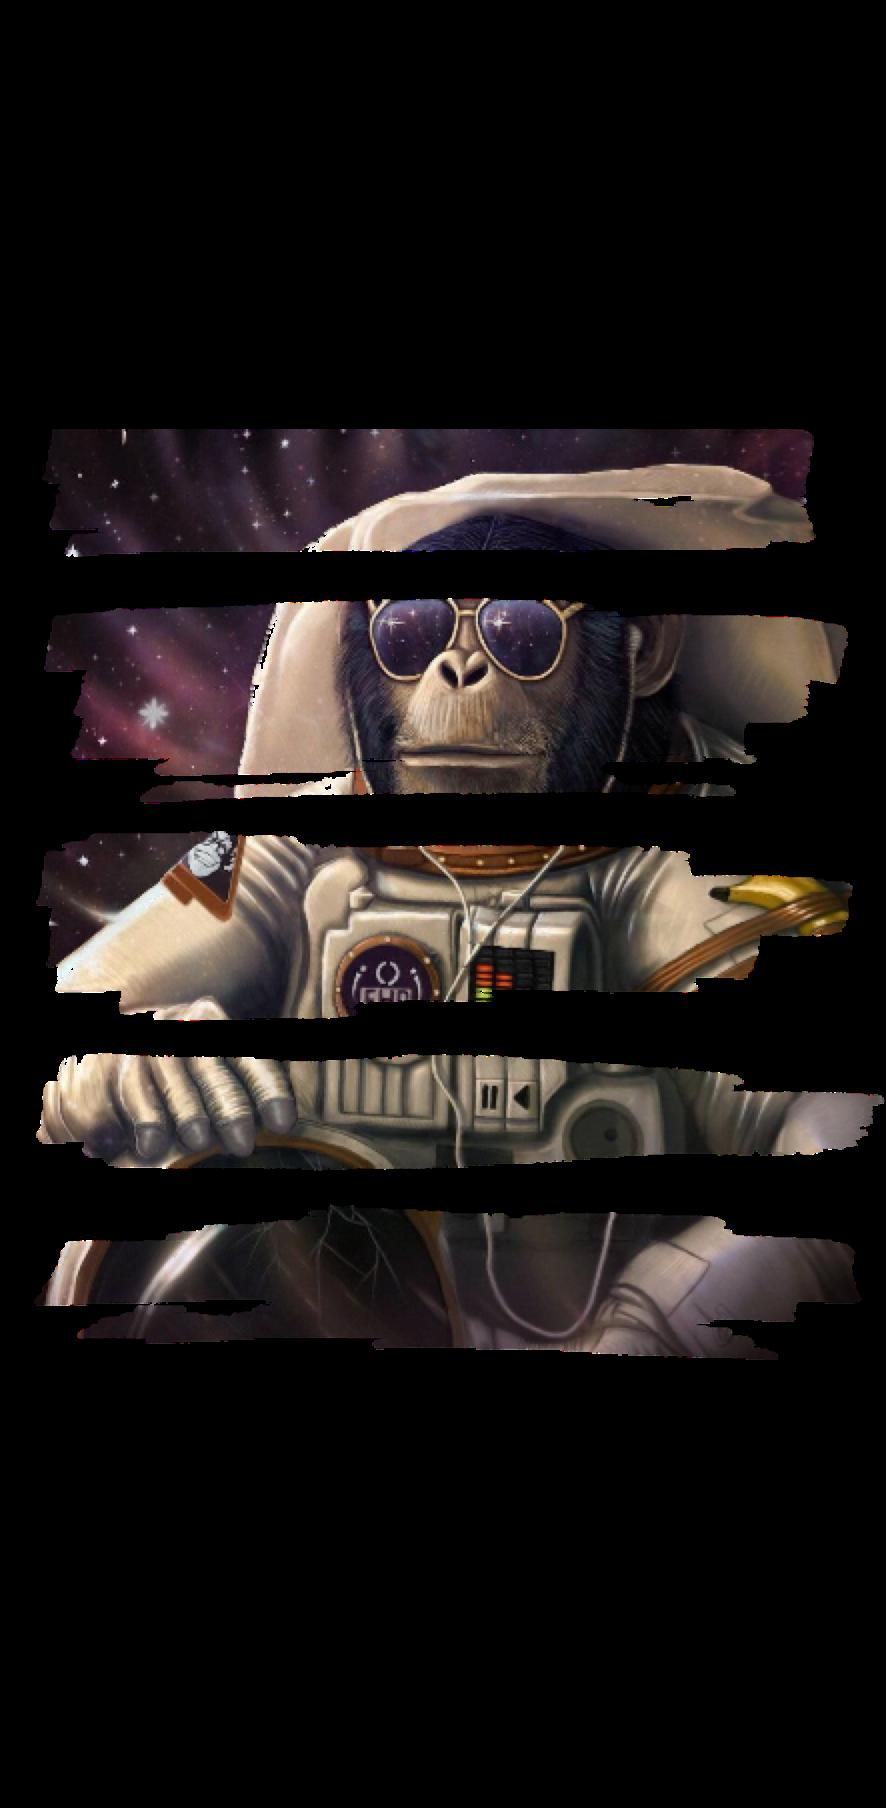 cover Astroneer Monkey